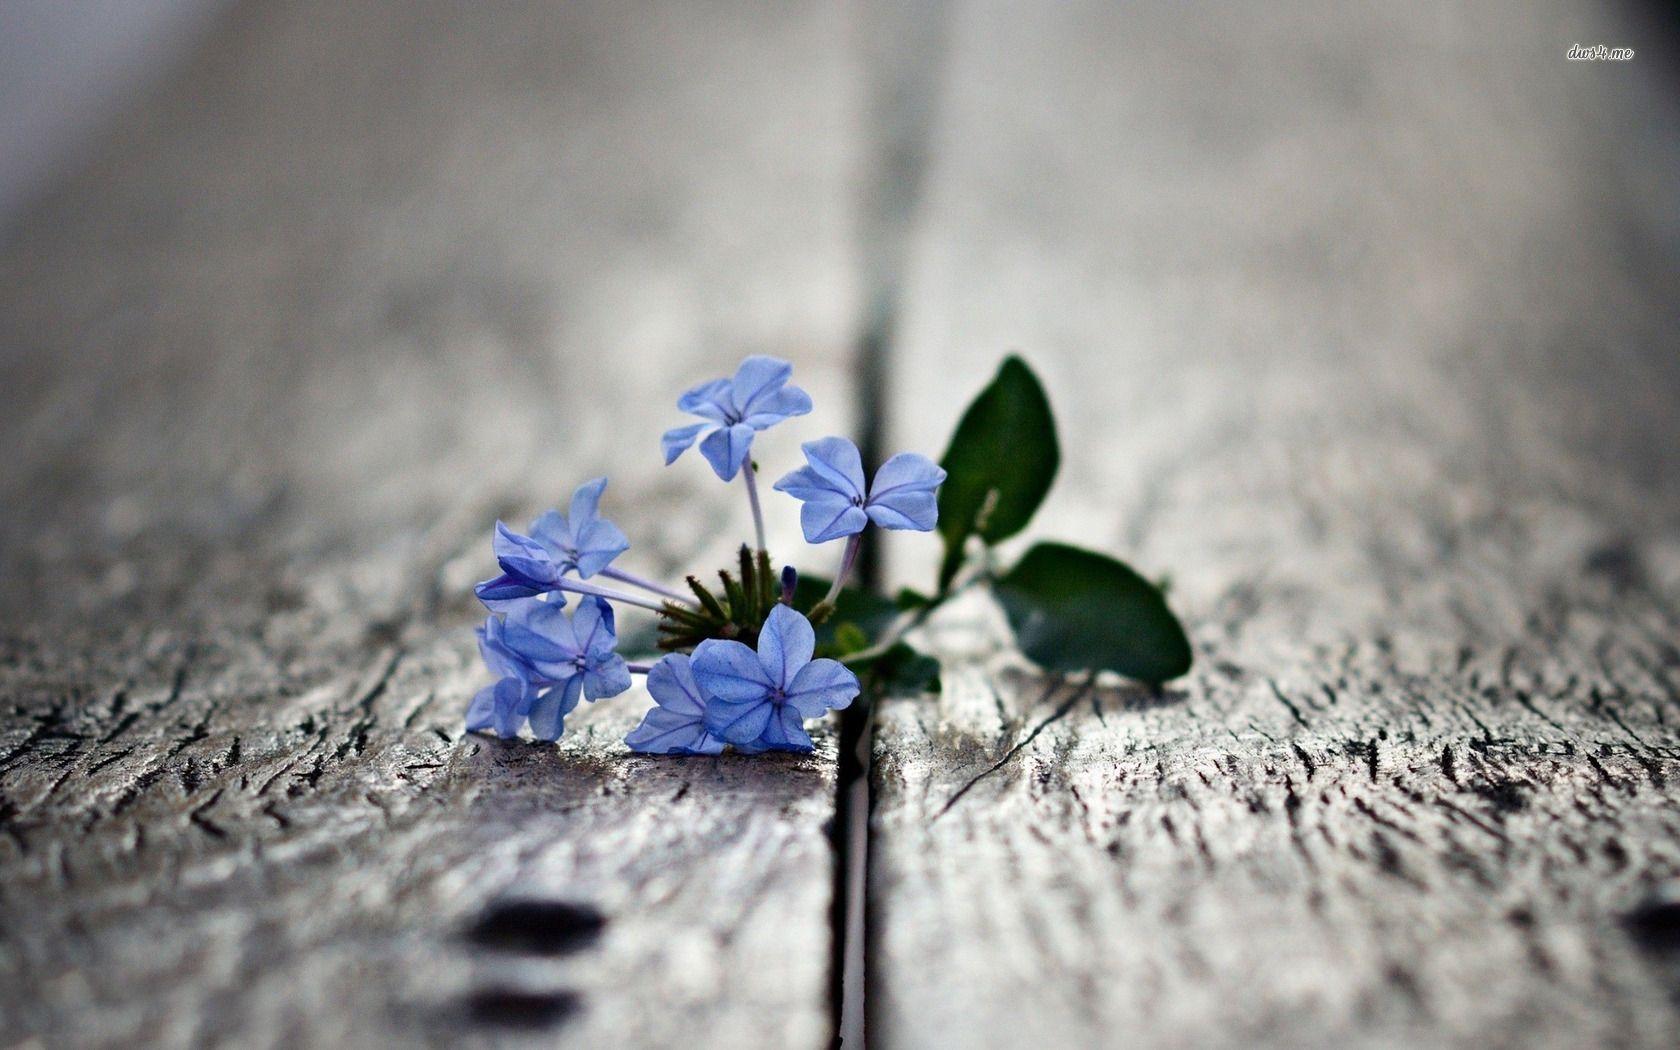 Small blue flower flowers pinterest blue flowers flower and small blue flower izmirmasajfo